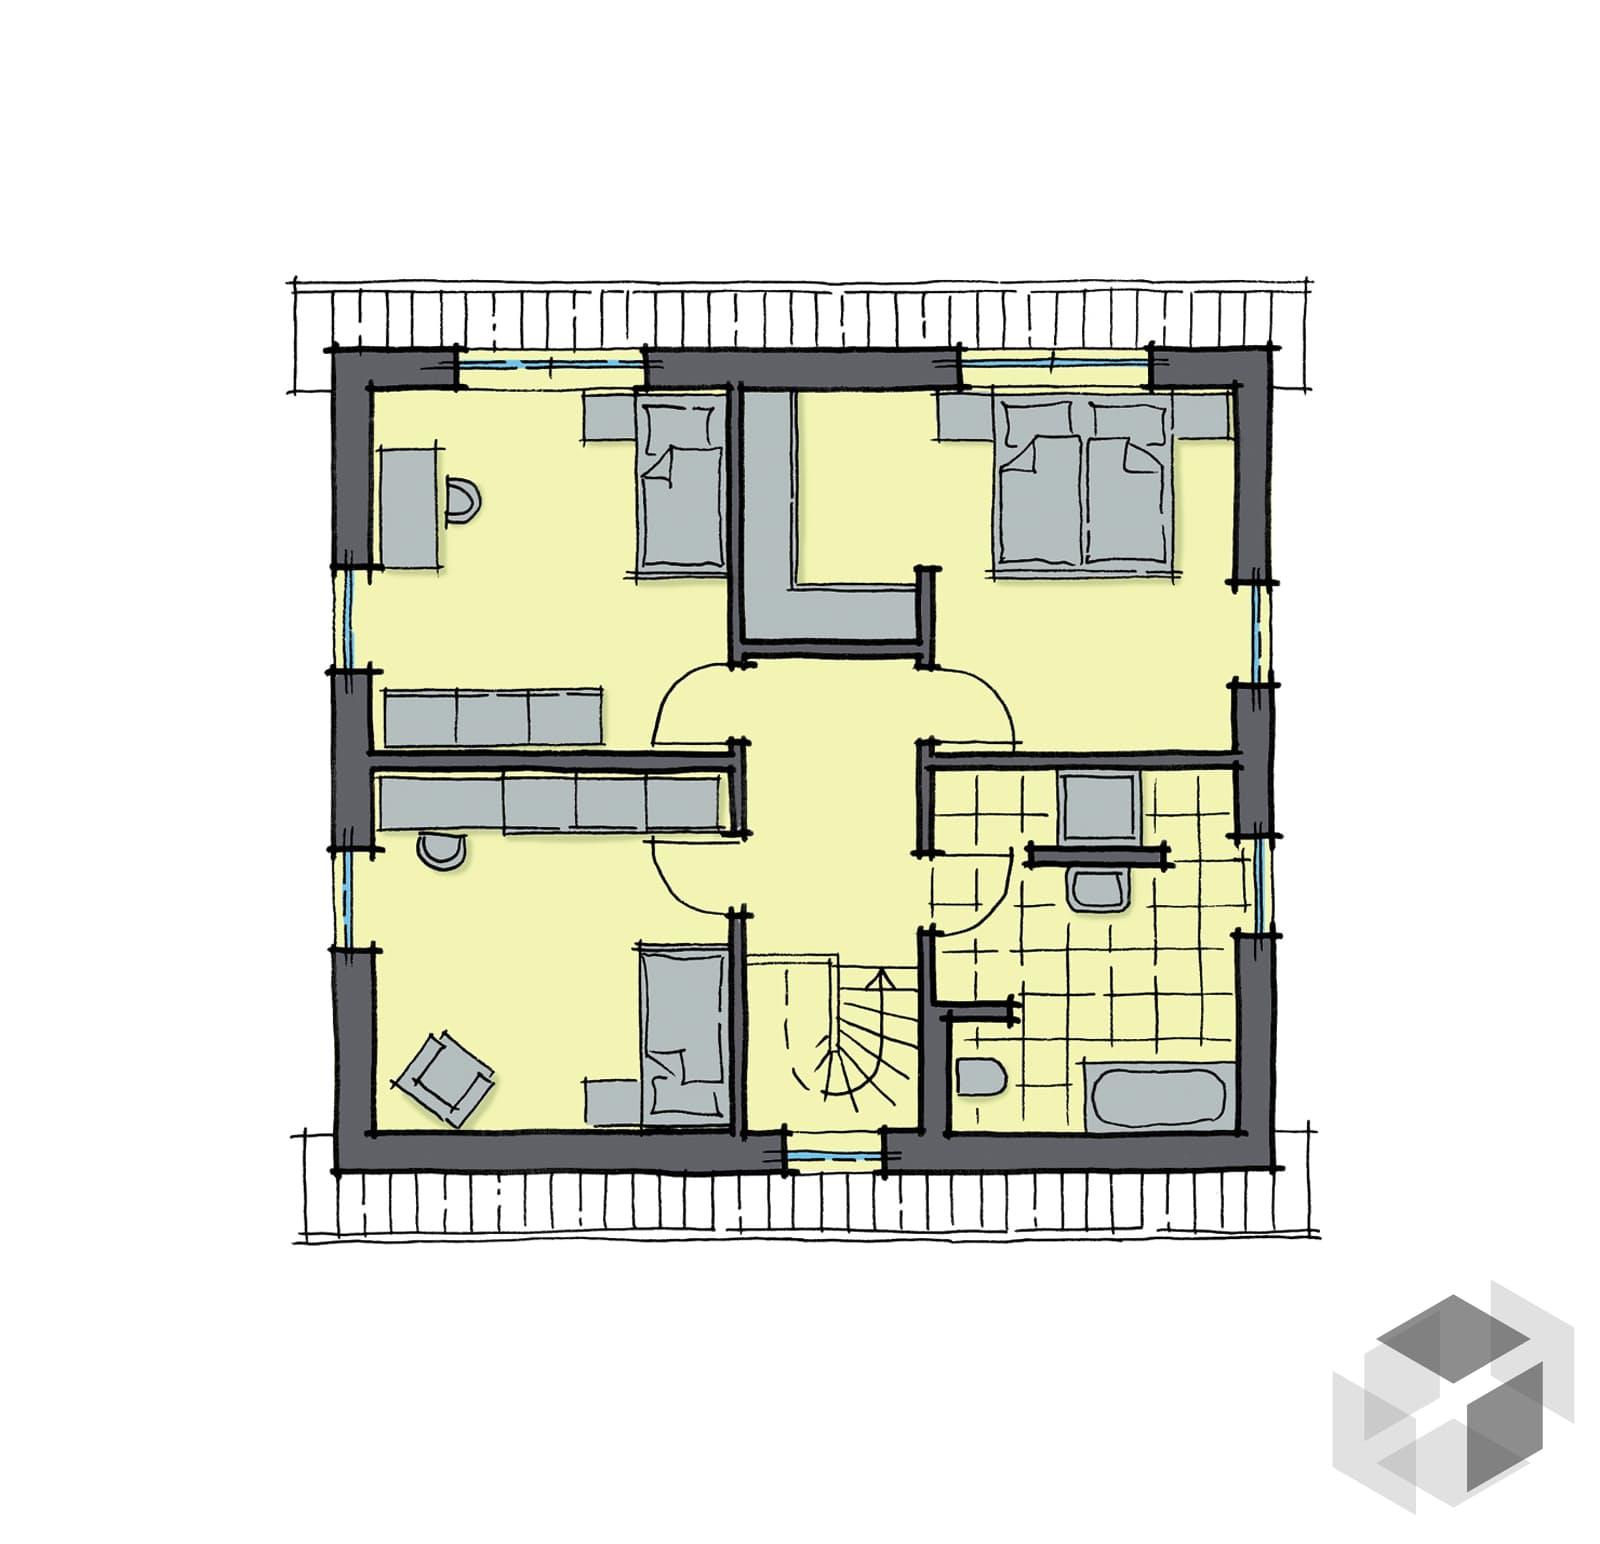 platanenallee von gussek haus komplette daten bersicht. Black Bedroom Furniture Sets. Home Design Ideas